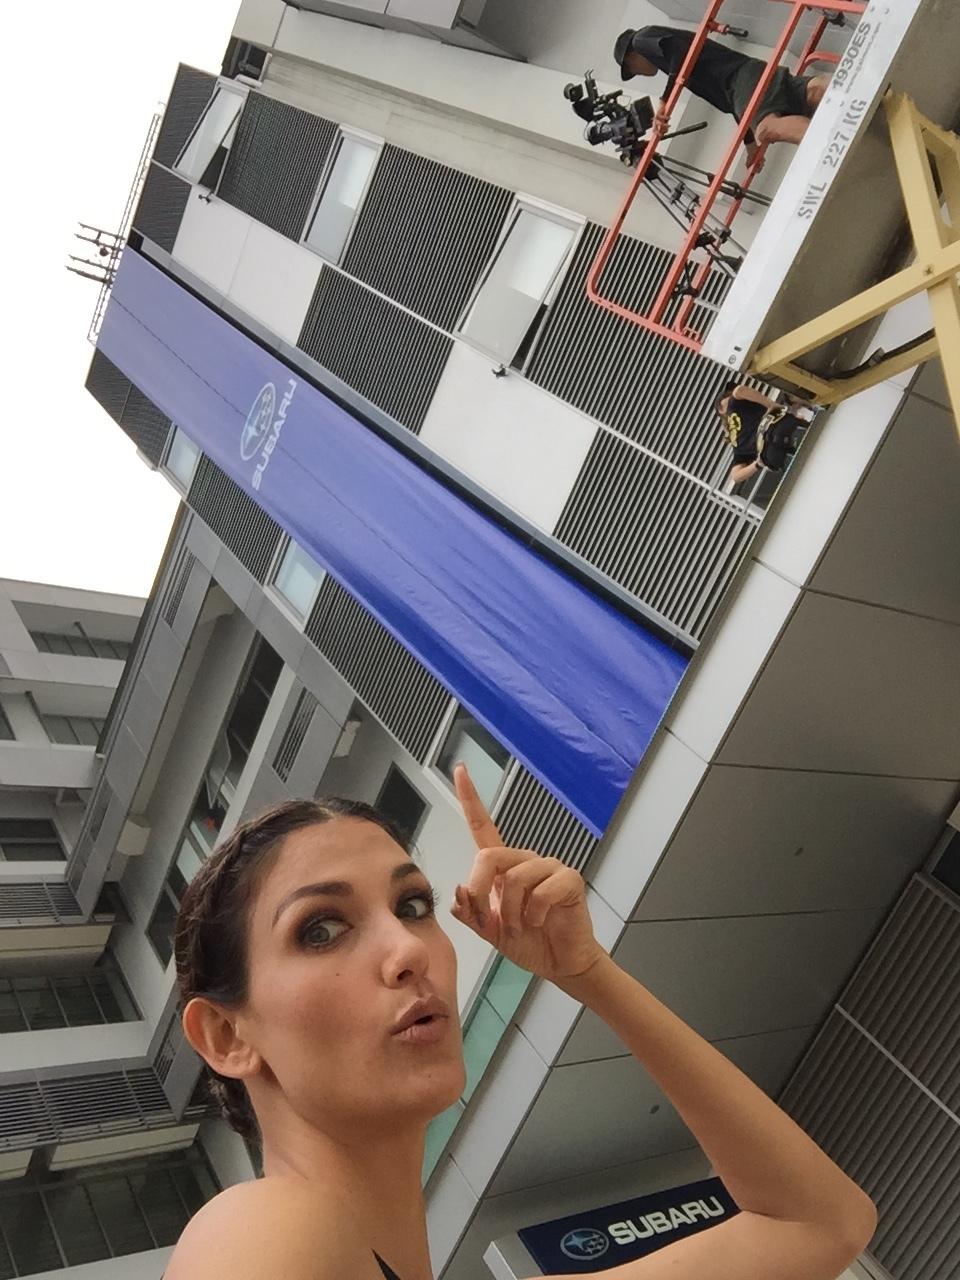 That crazy vertical catwalk challenge!